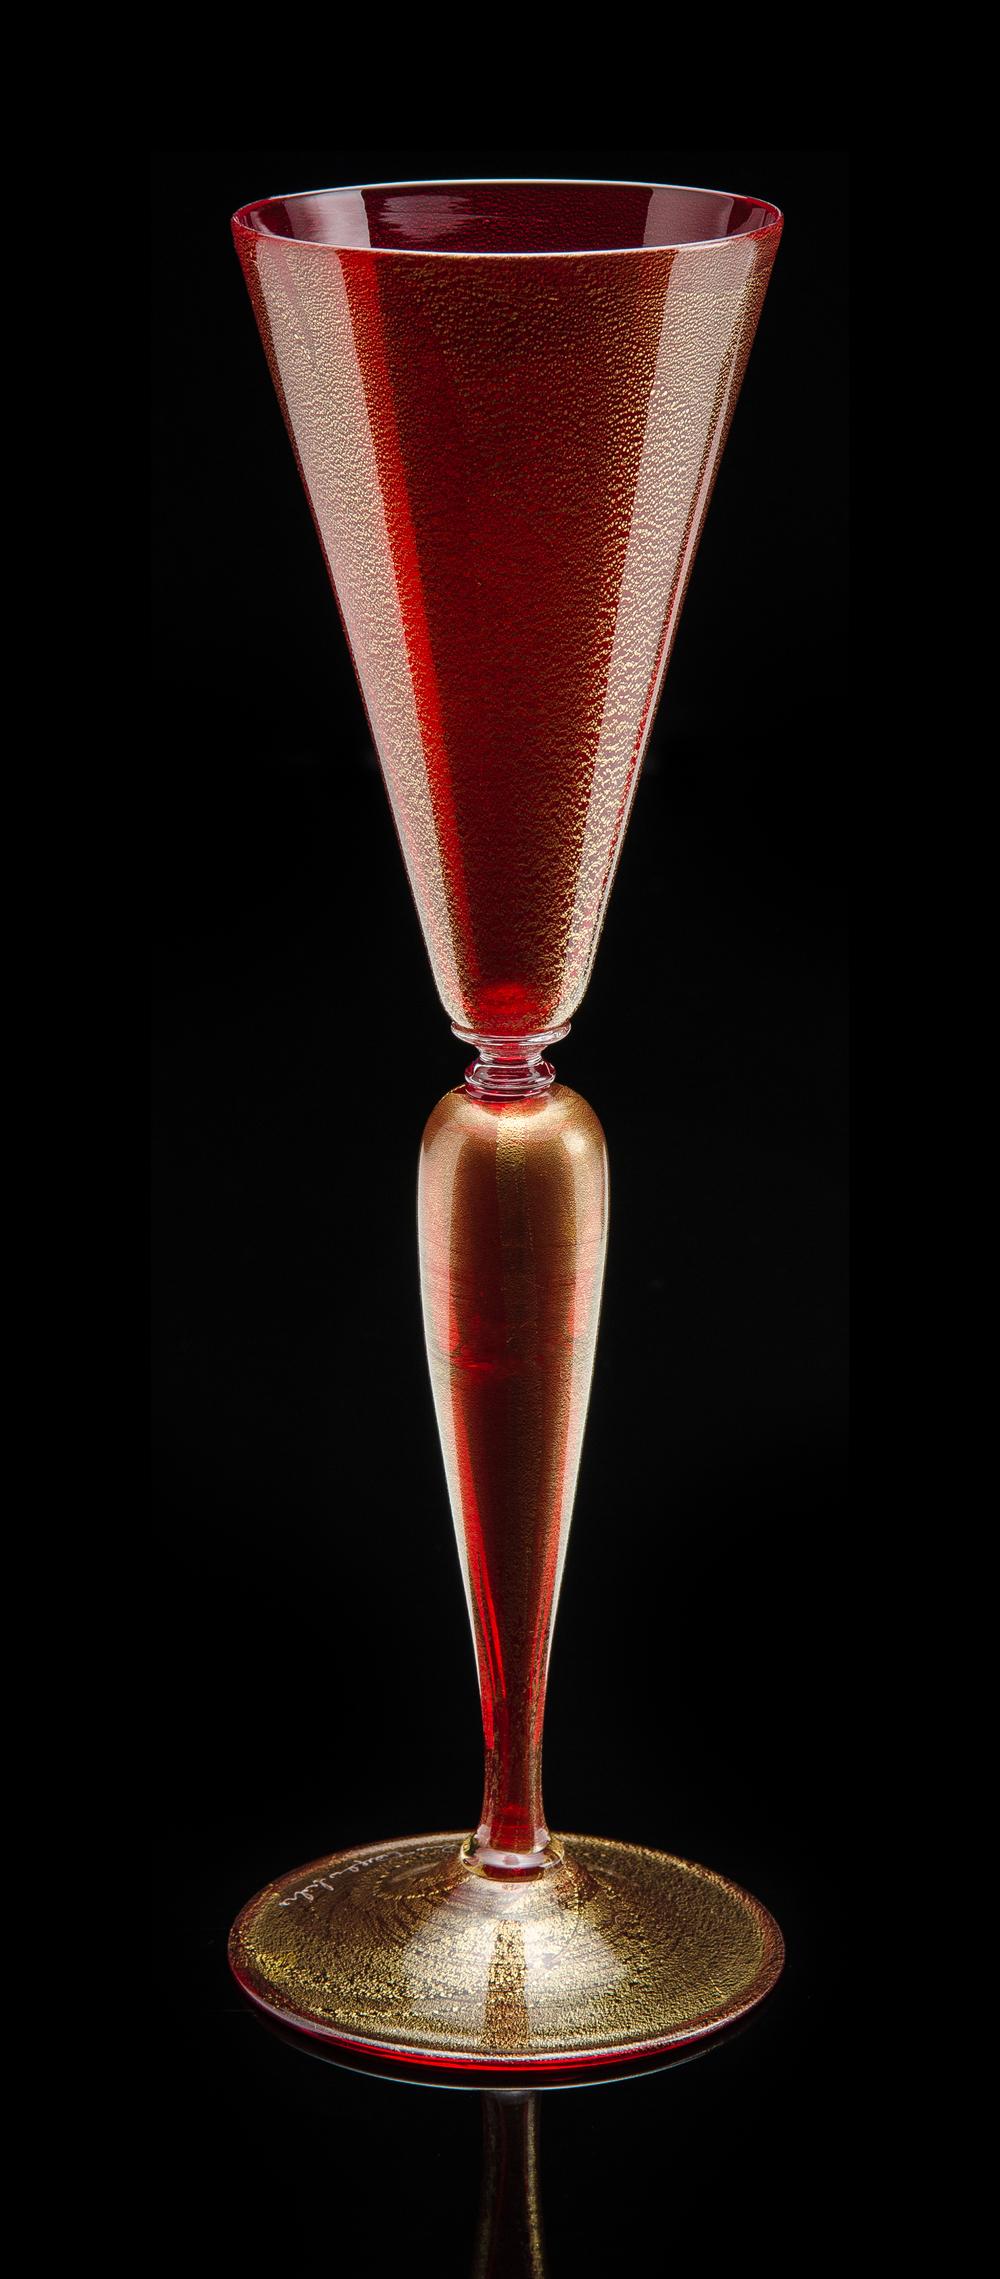 Lino Tagliapietra, Goblet (1991-1994, glass, 10 1/4 x 3 1/4 x 3 1/4 inches), LT.76